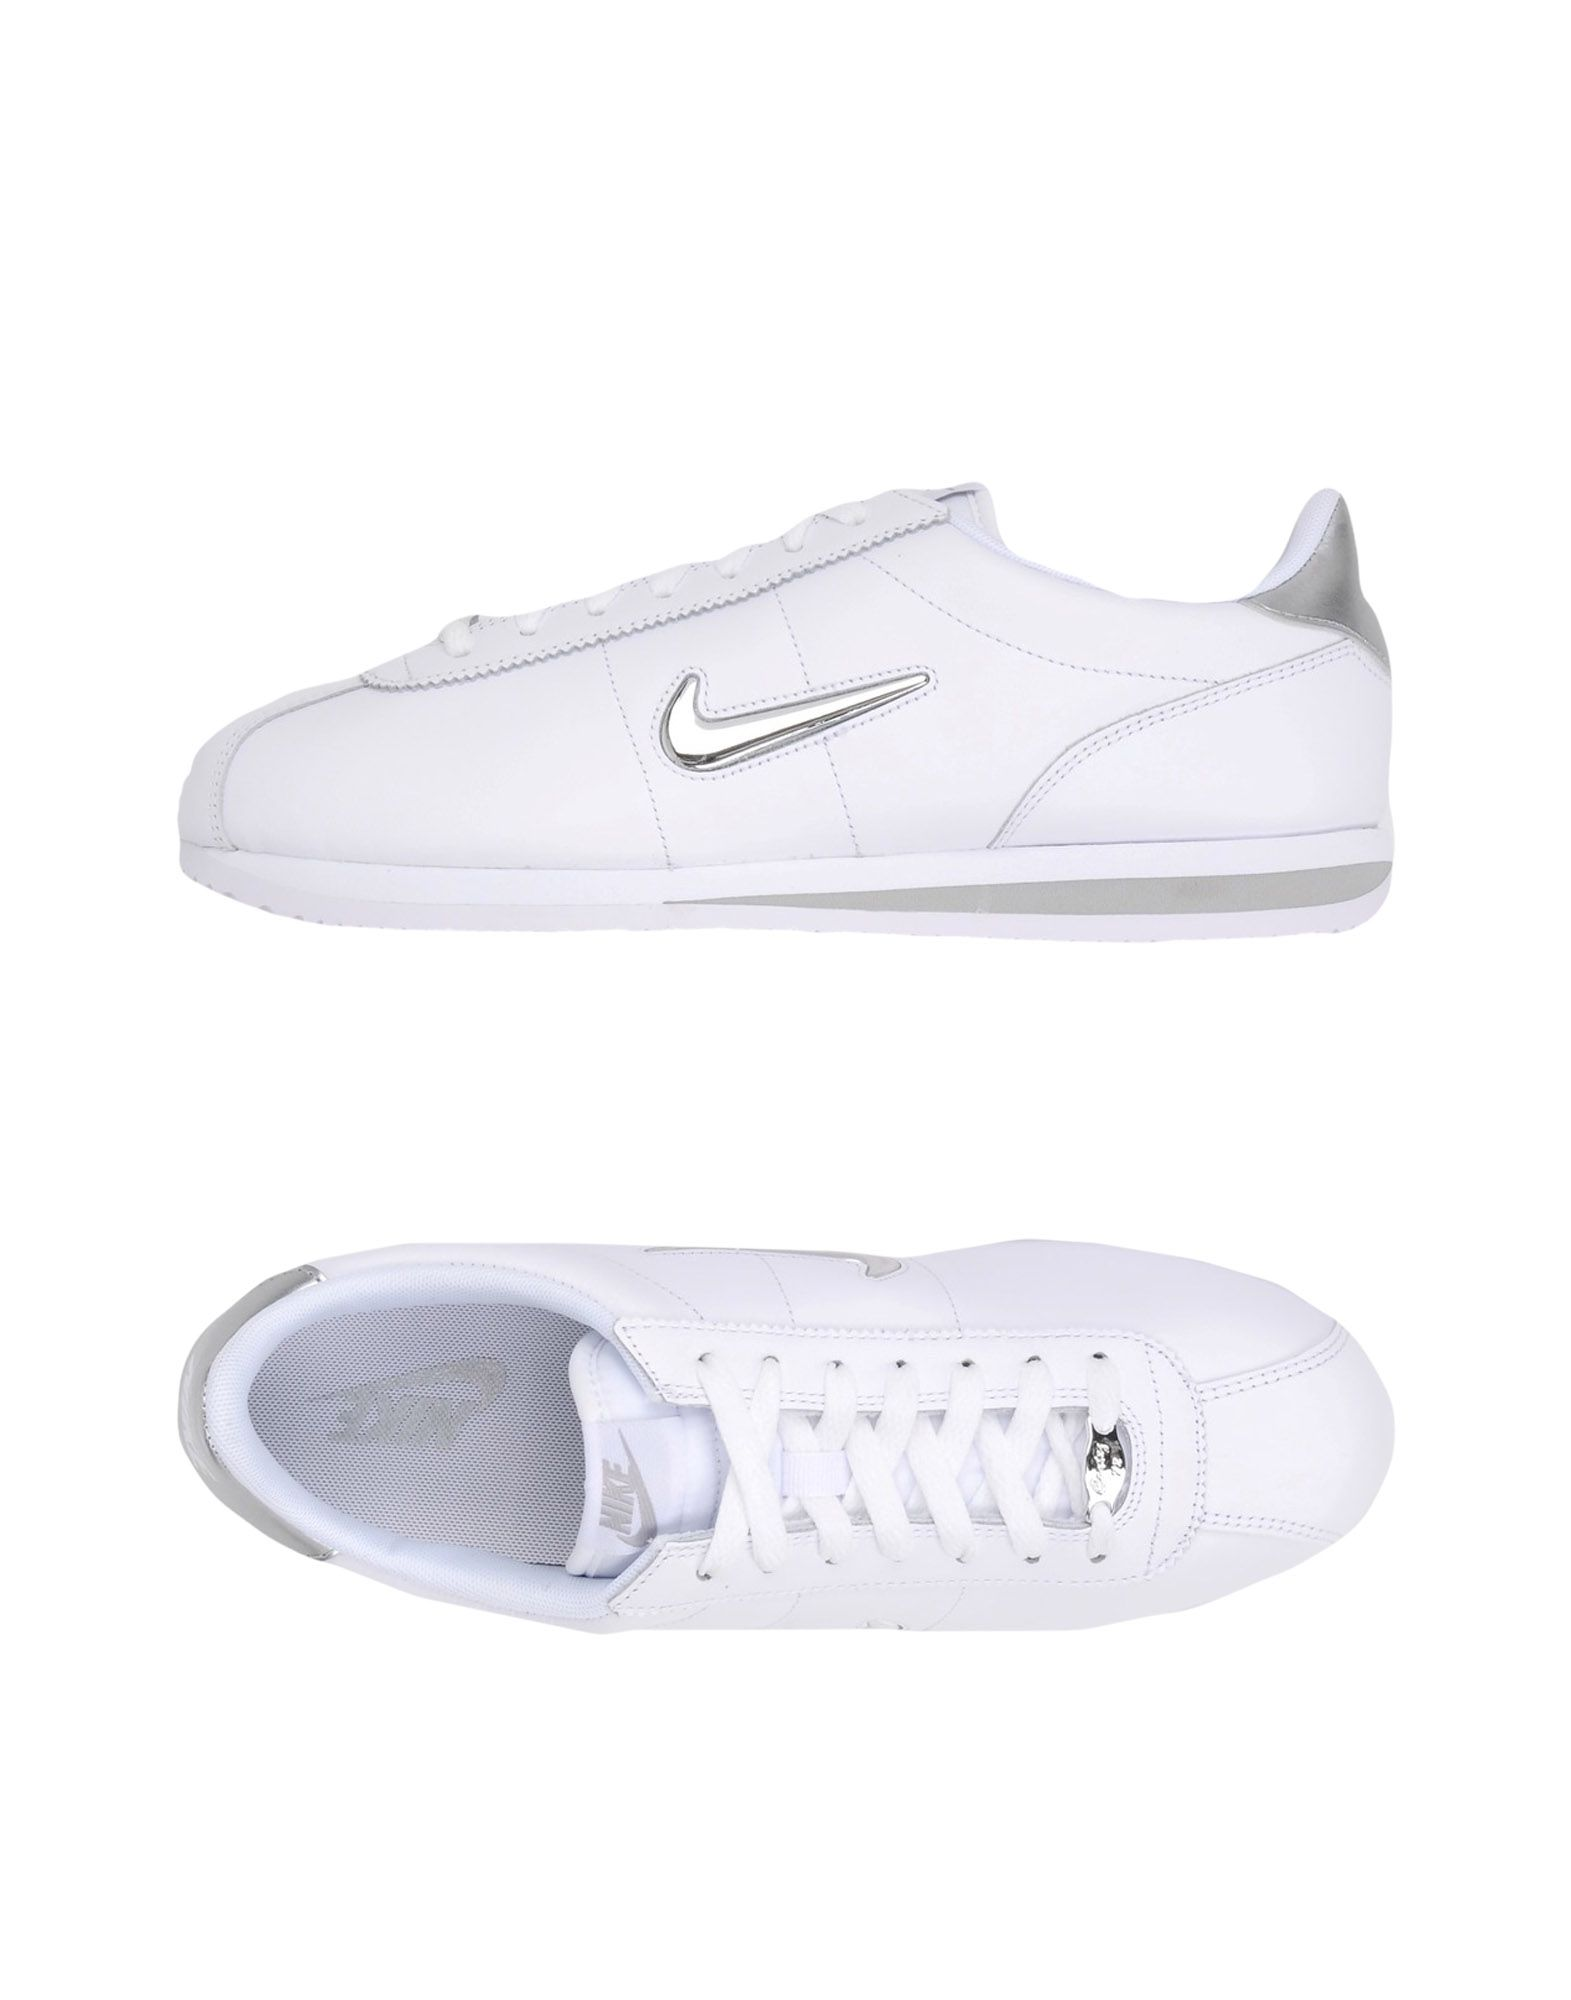 Rabatt echte Schuhe Nike Cortez Basic Jewel  11379529NR